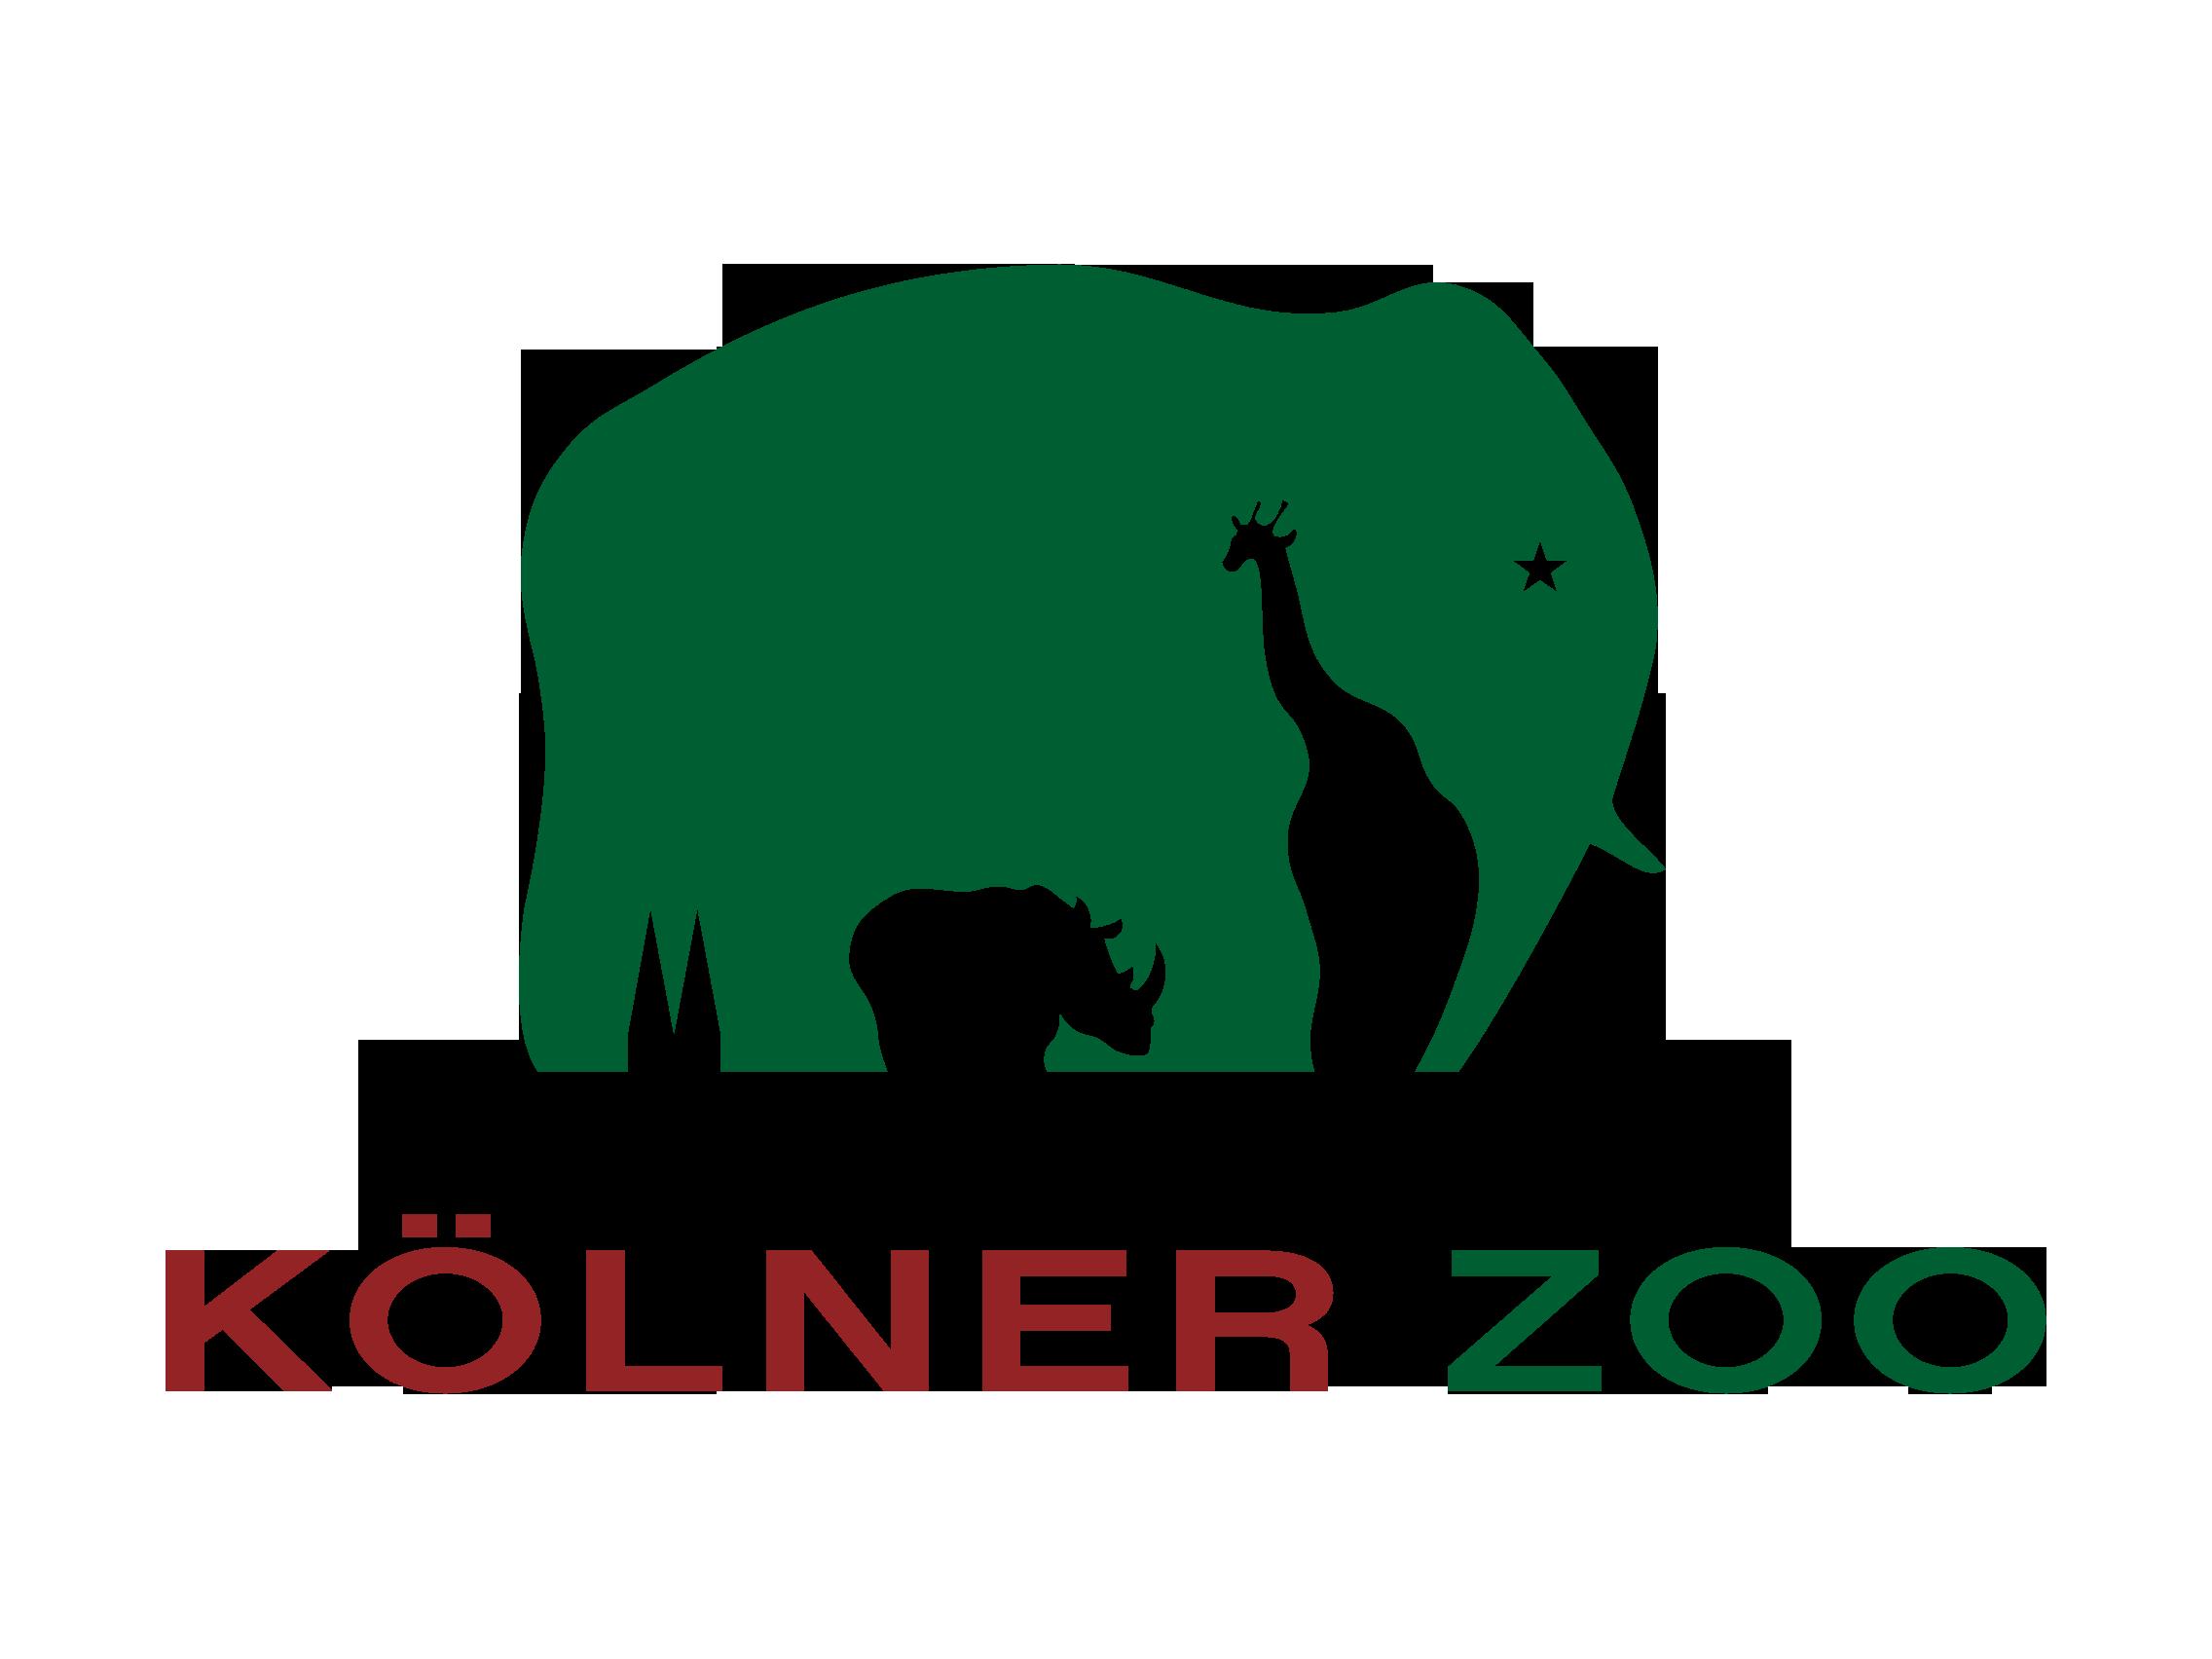 Kolner Zoo